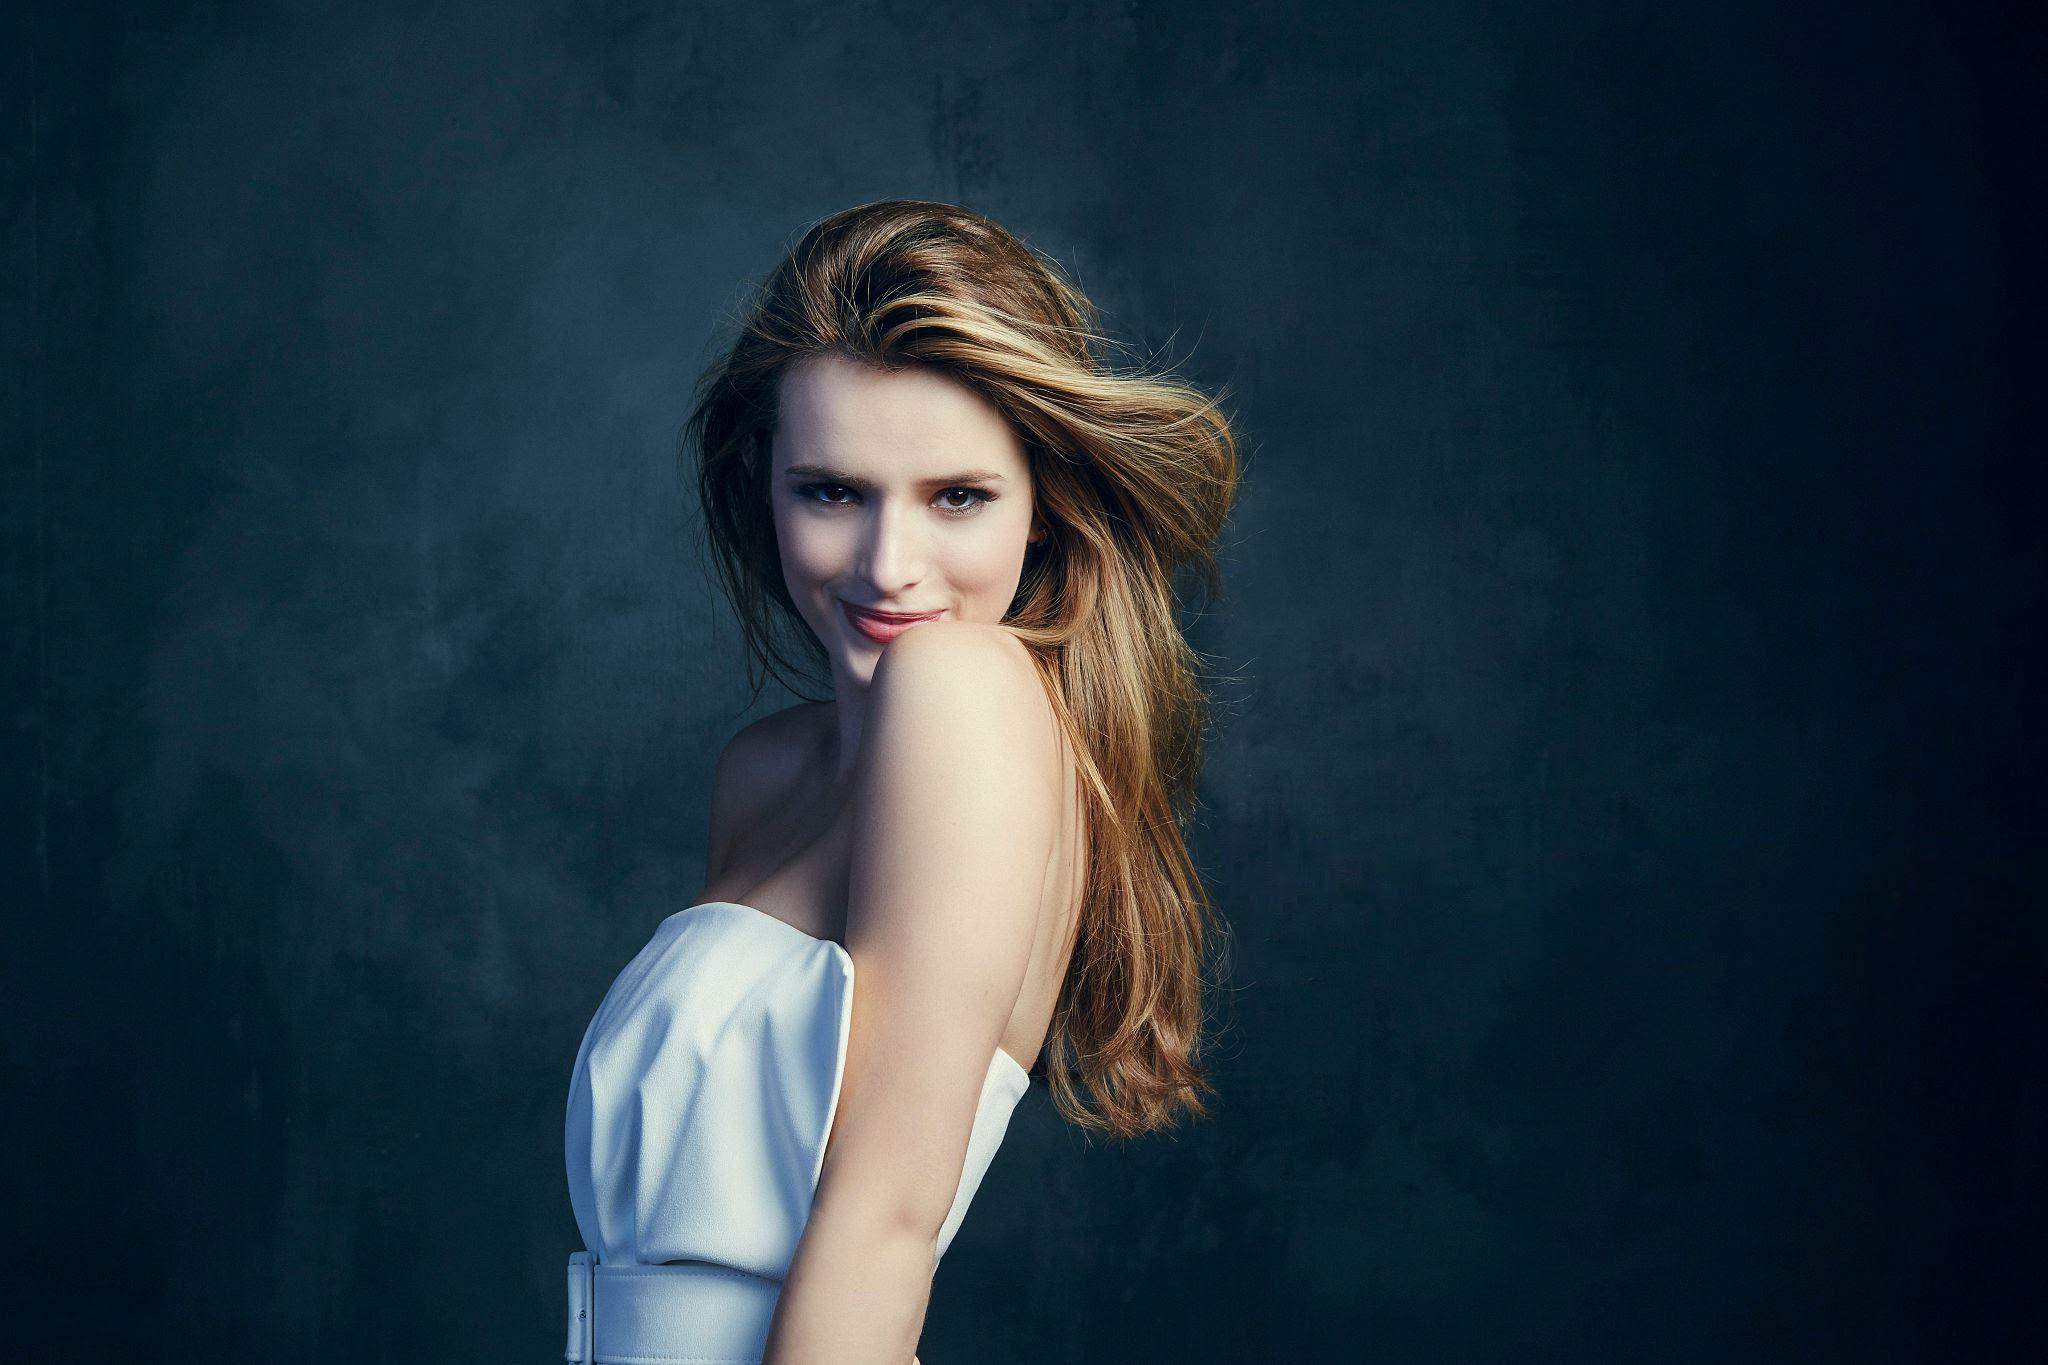 Beautiful bella thorne hd celebrities 4k wallpapers - Bella thorne wallpaper ...